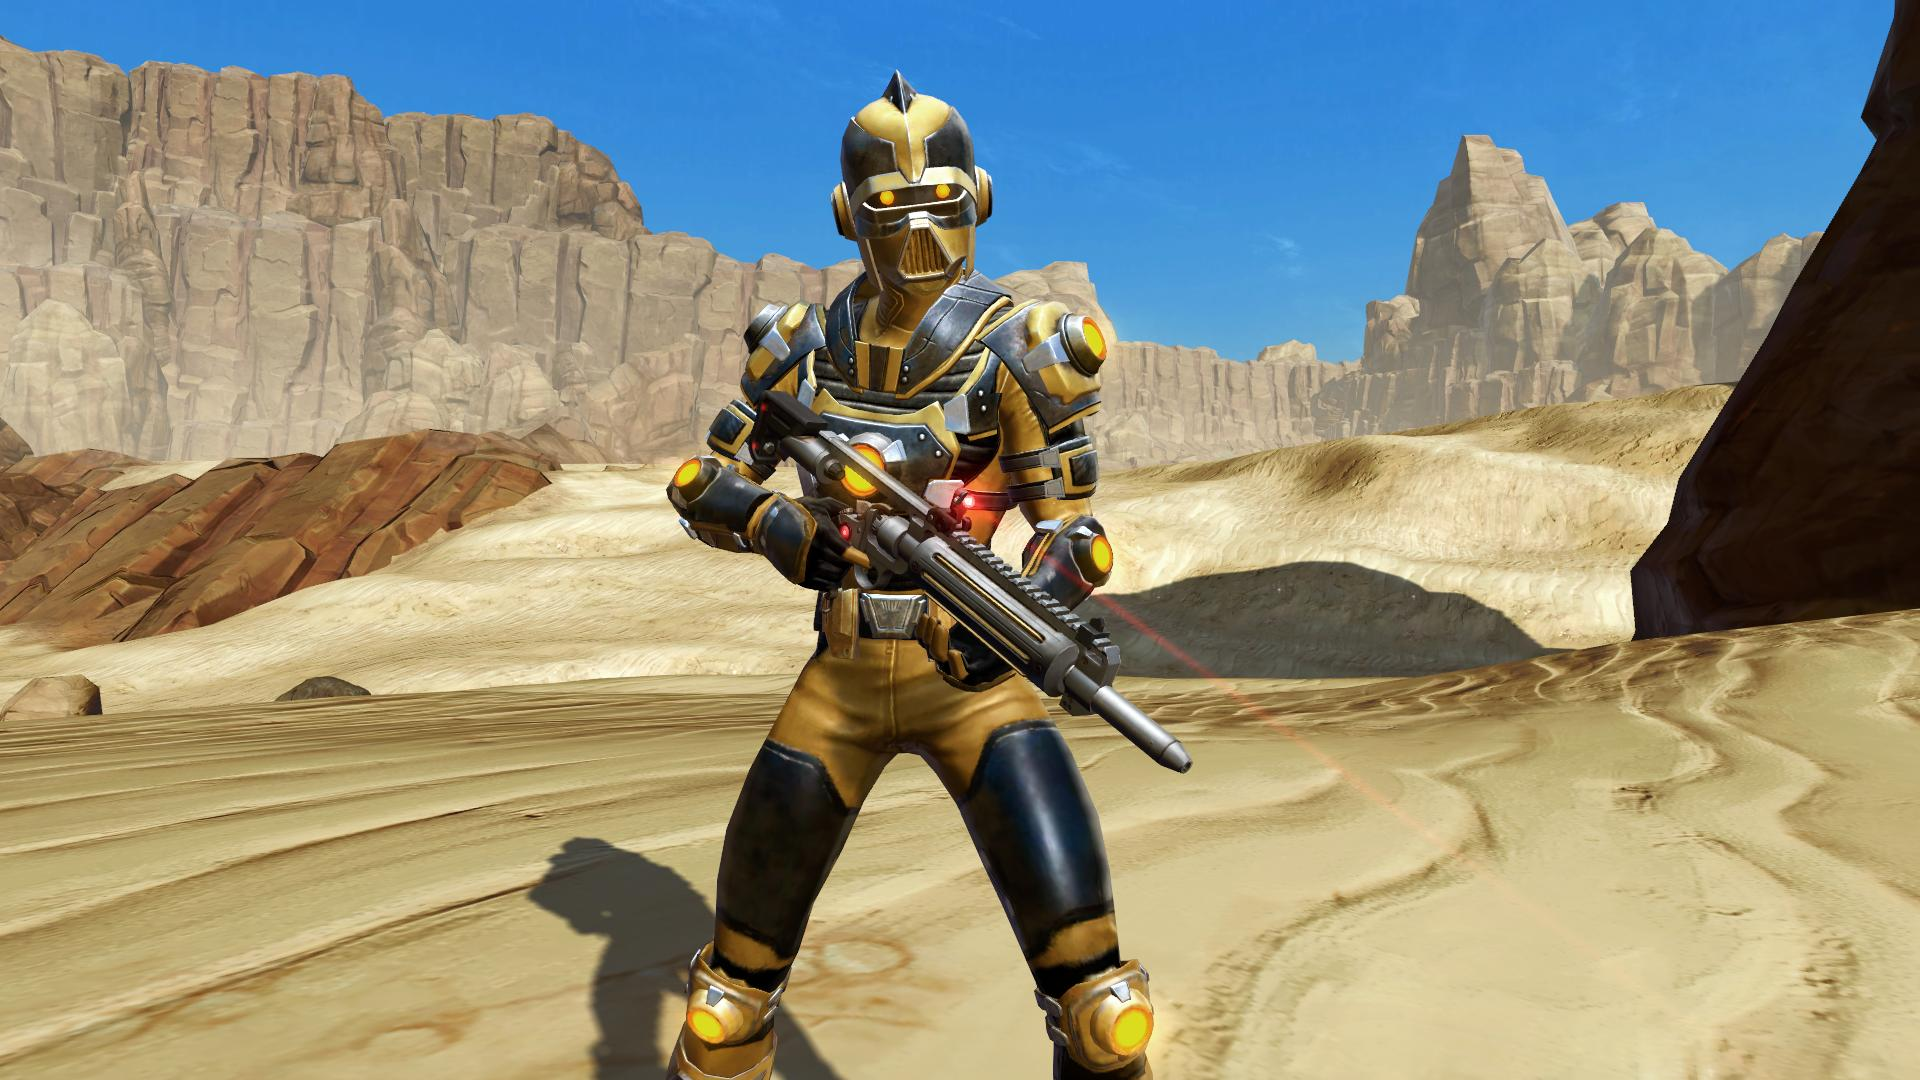 bionic_warrior_armor_set.jpg